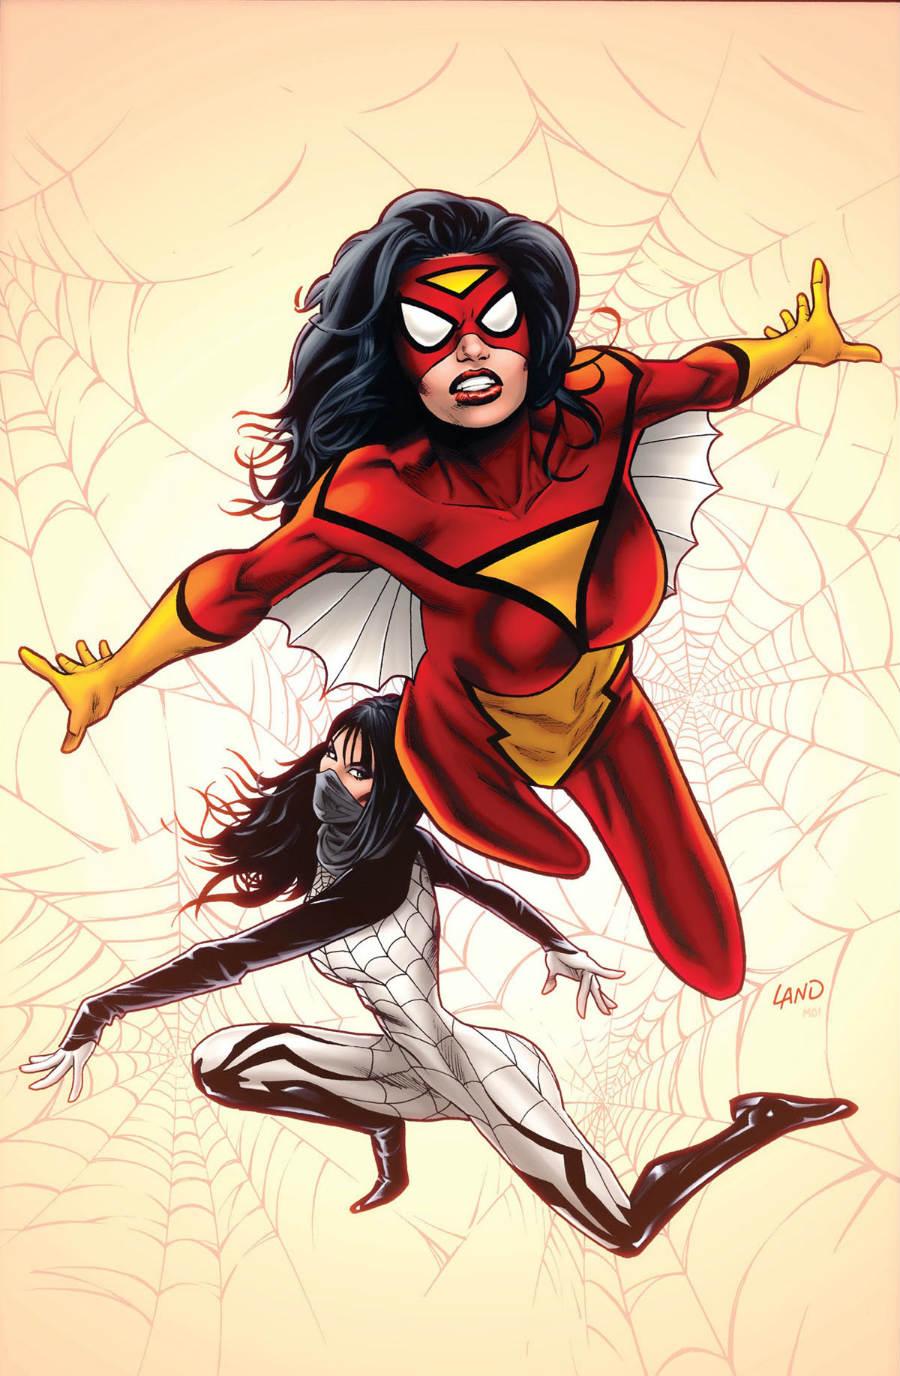 http://www.zonanegativa.com/imagenes/2014/07/Spider-Woman_1_Portada_Land.jpg